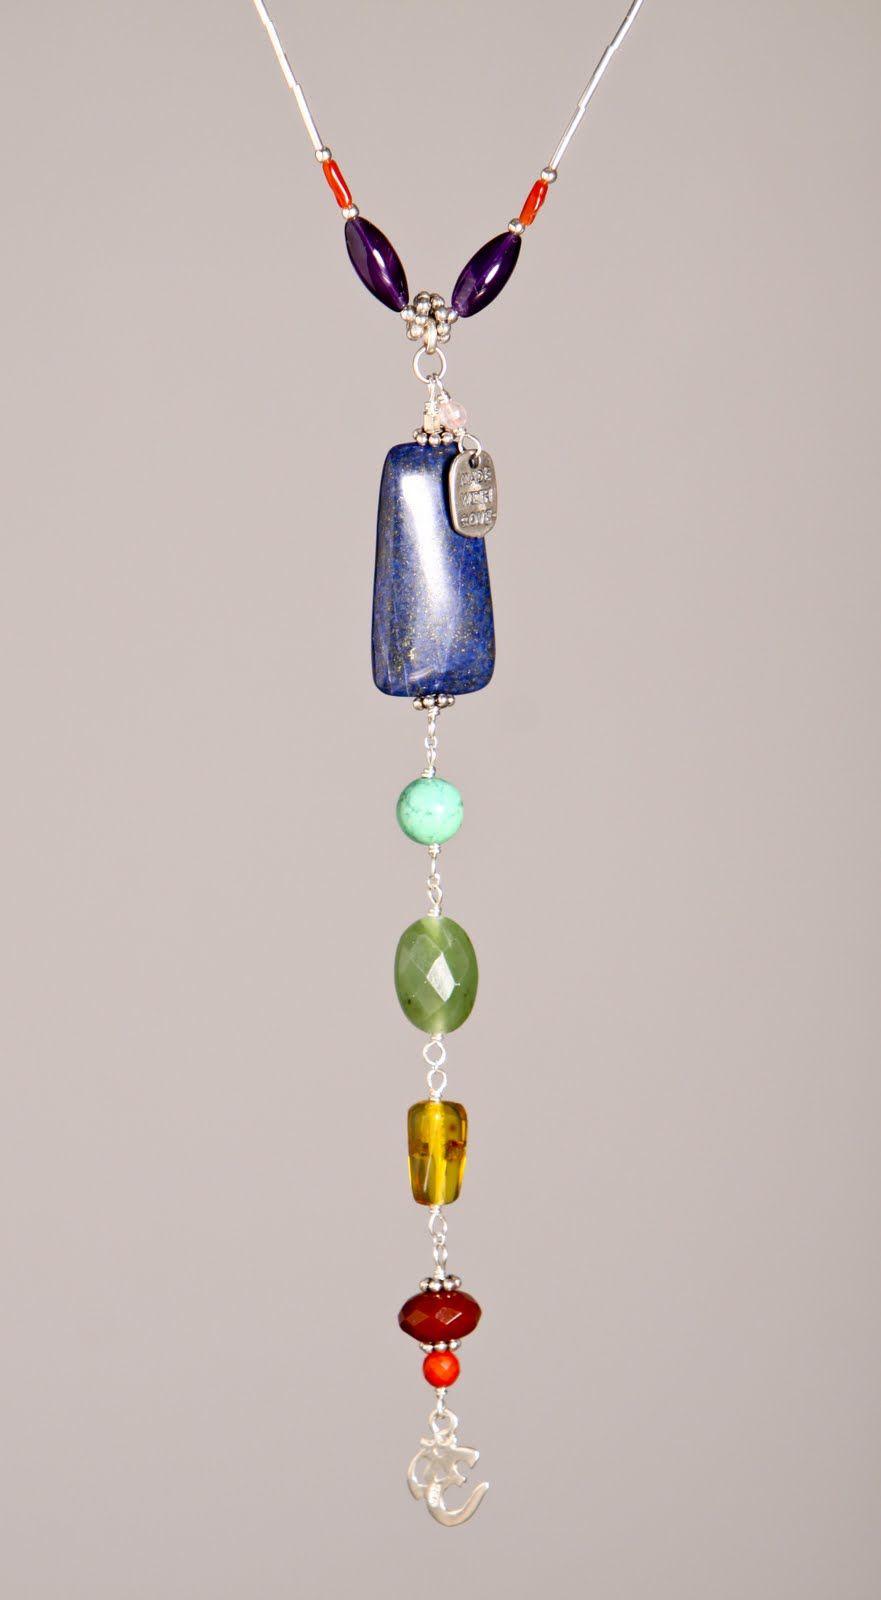 Araceli Silva Jewelry Shop: Chakras perfect for Fernanda